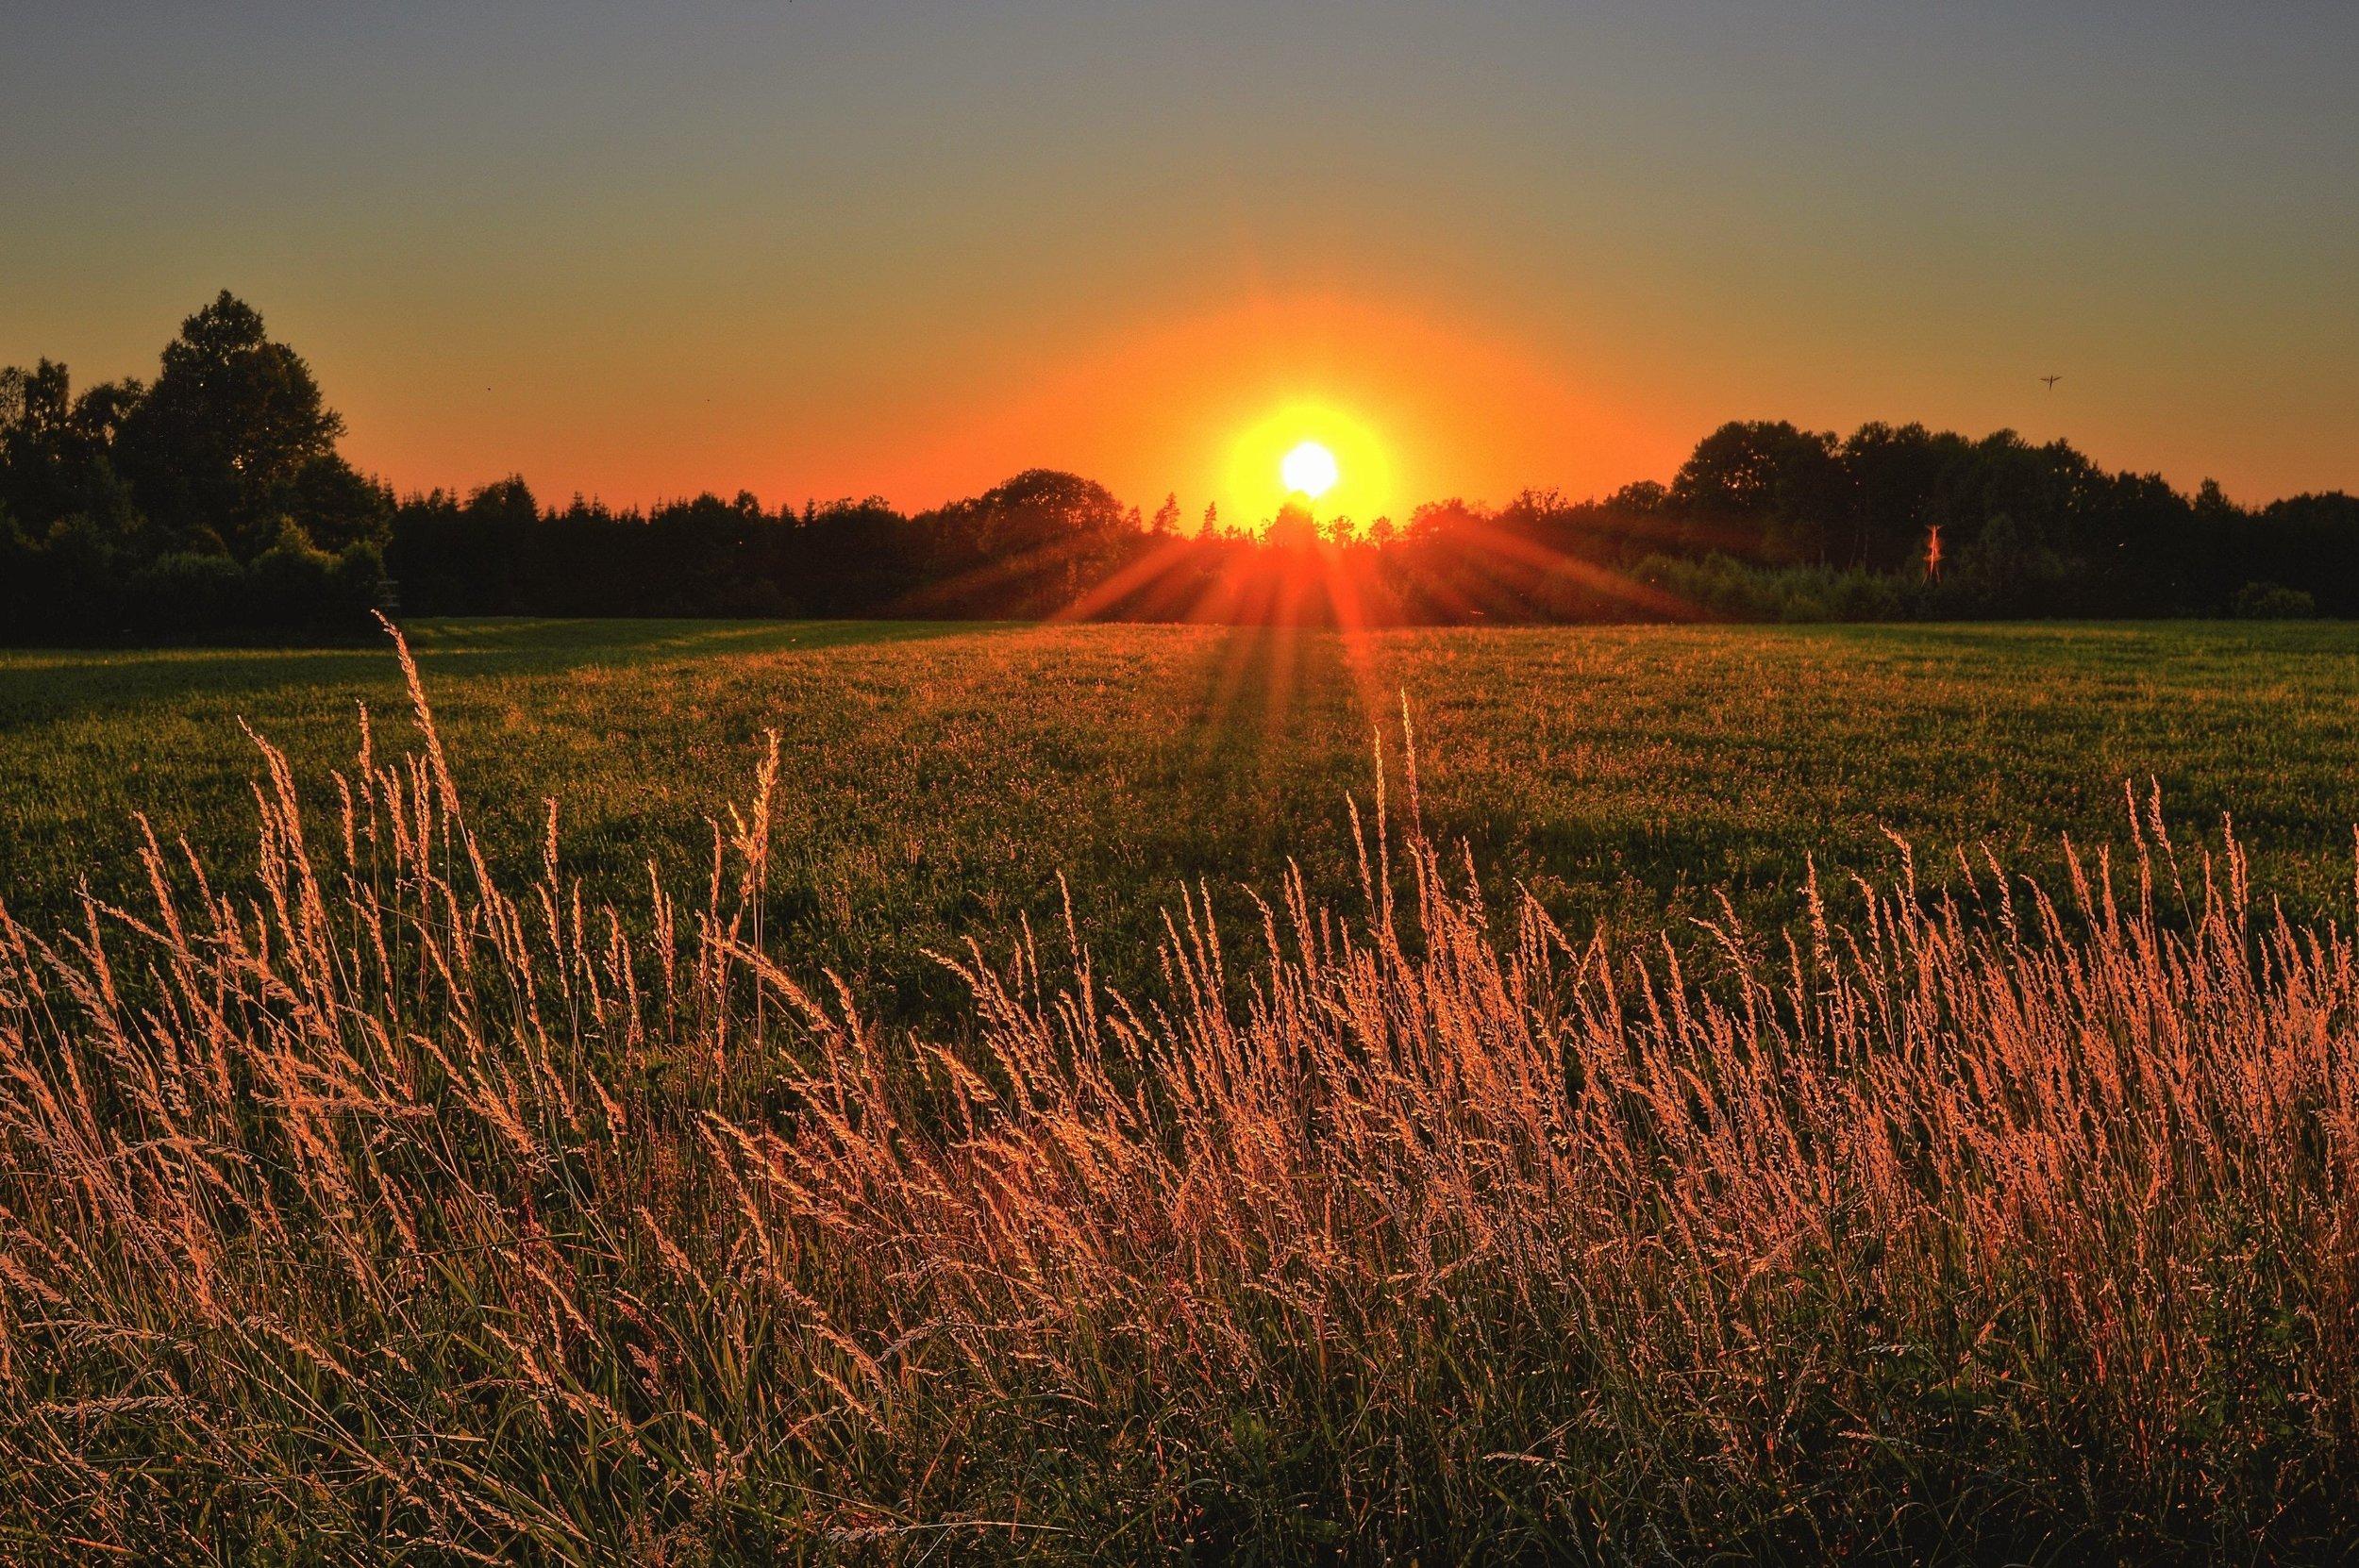 beautiful-beautiful-view-countryside-1237119.jpg